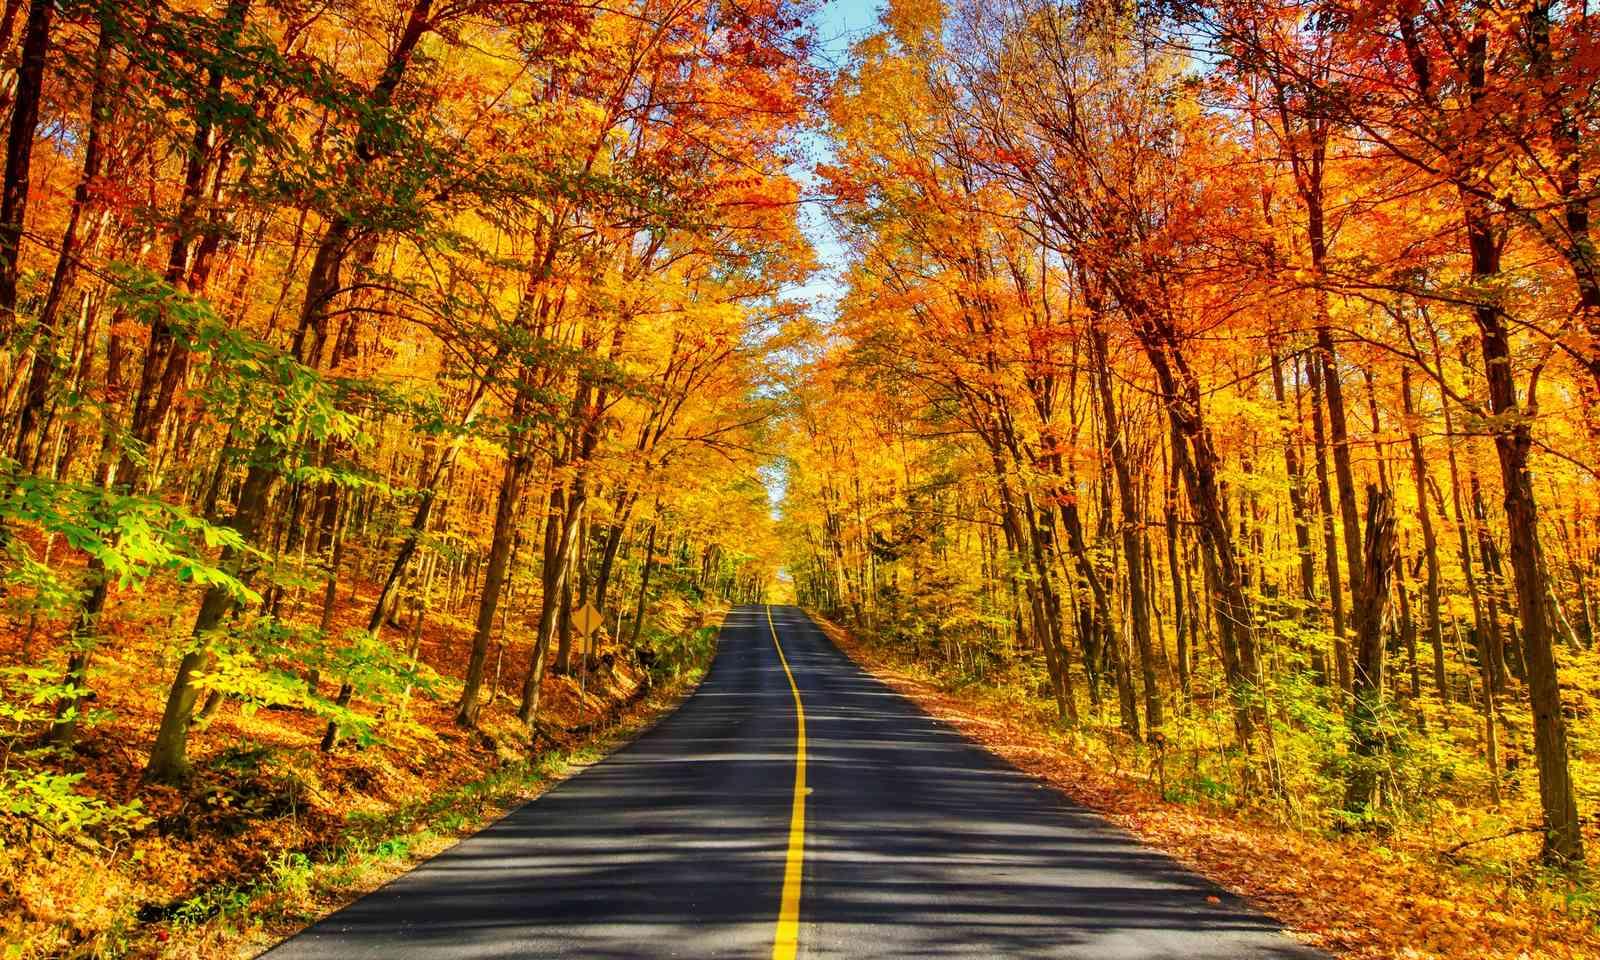 Autumn leaves in Muskoka (Shutterstock.com)